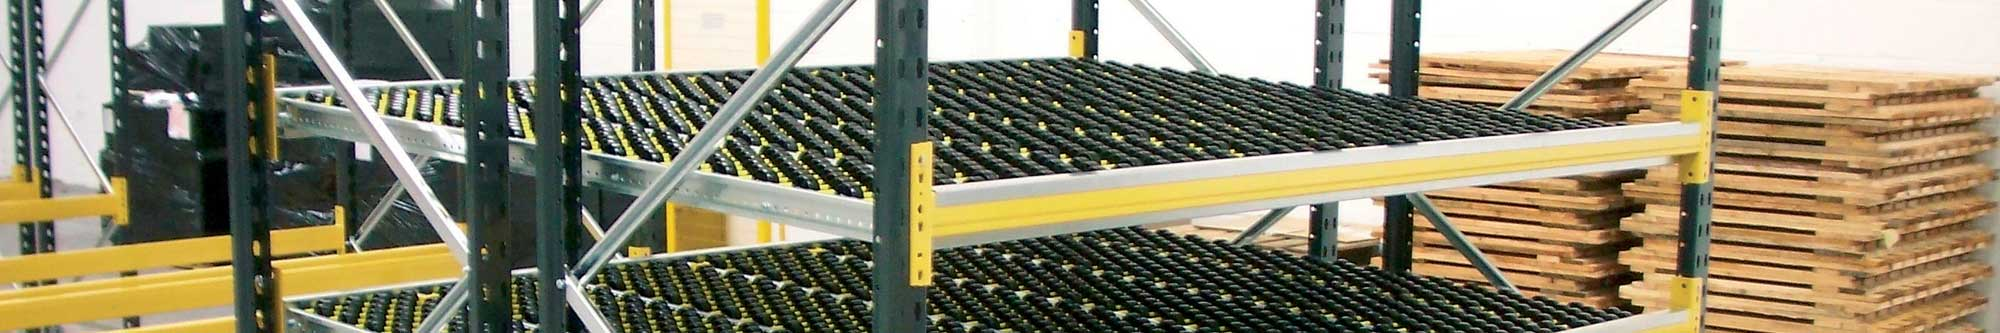 Pallet Live Storage Racking